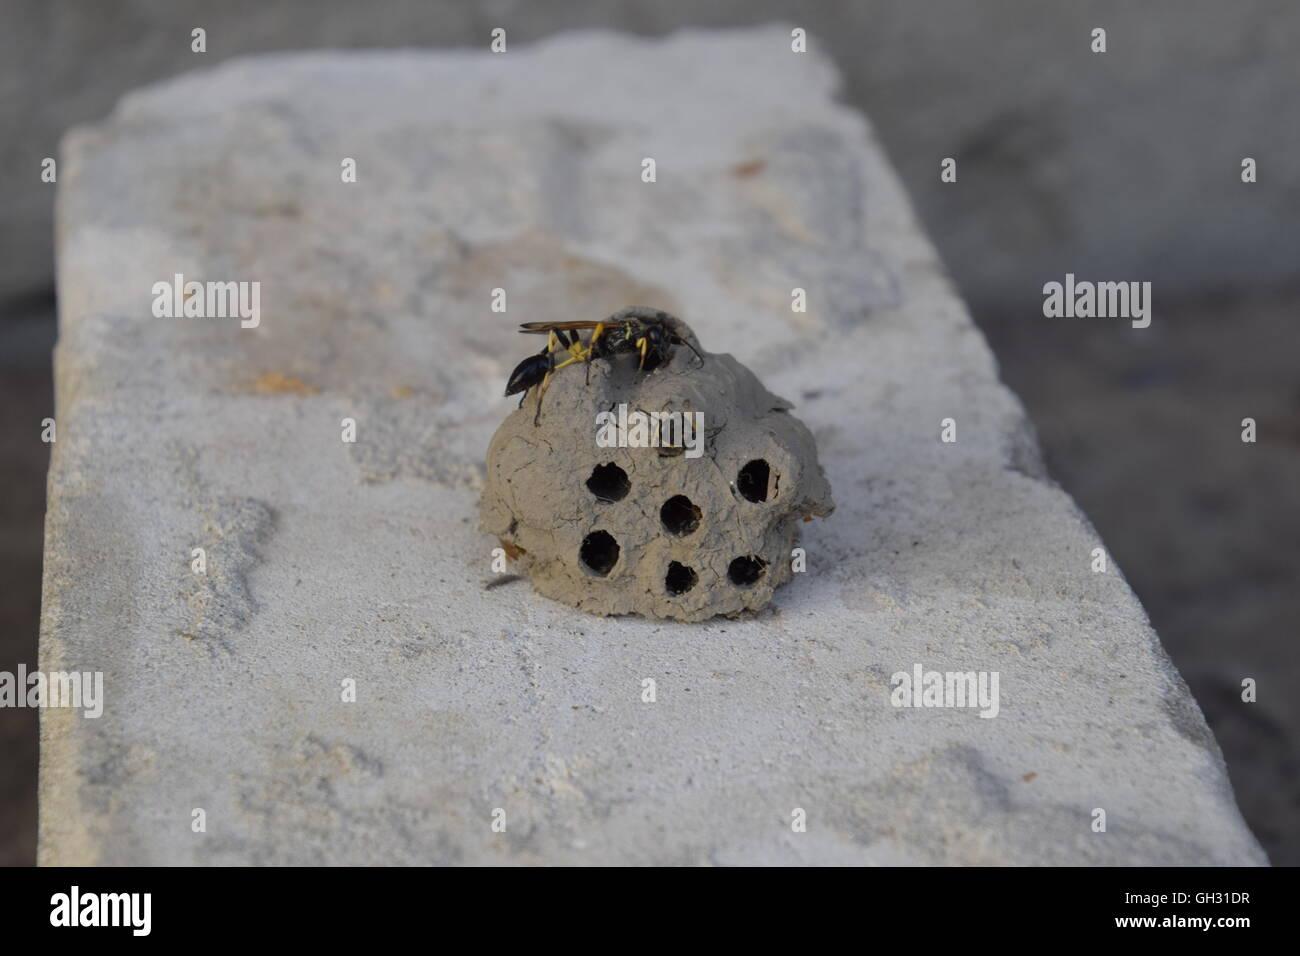 wasp clay nest stockfotos wasp clay nest bilder alamy. Black Bedroom Furniture Sets. Home Design Ideas